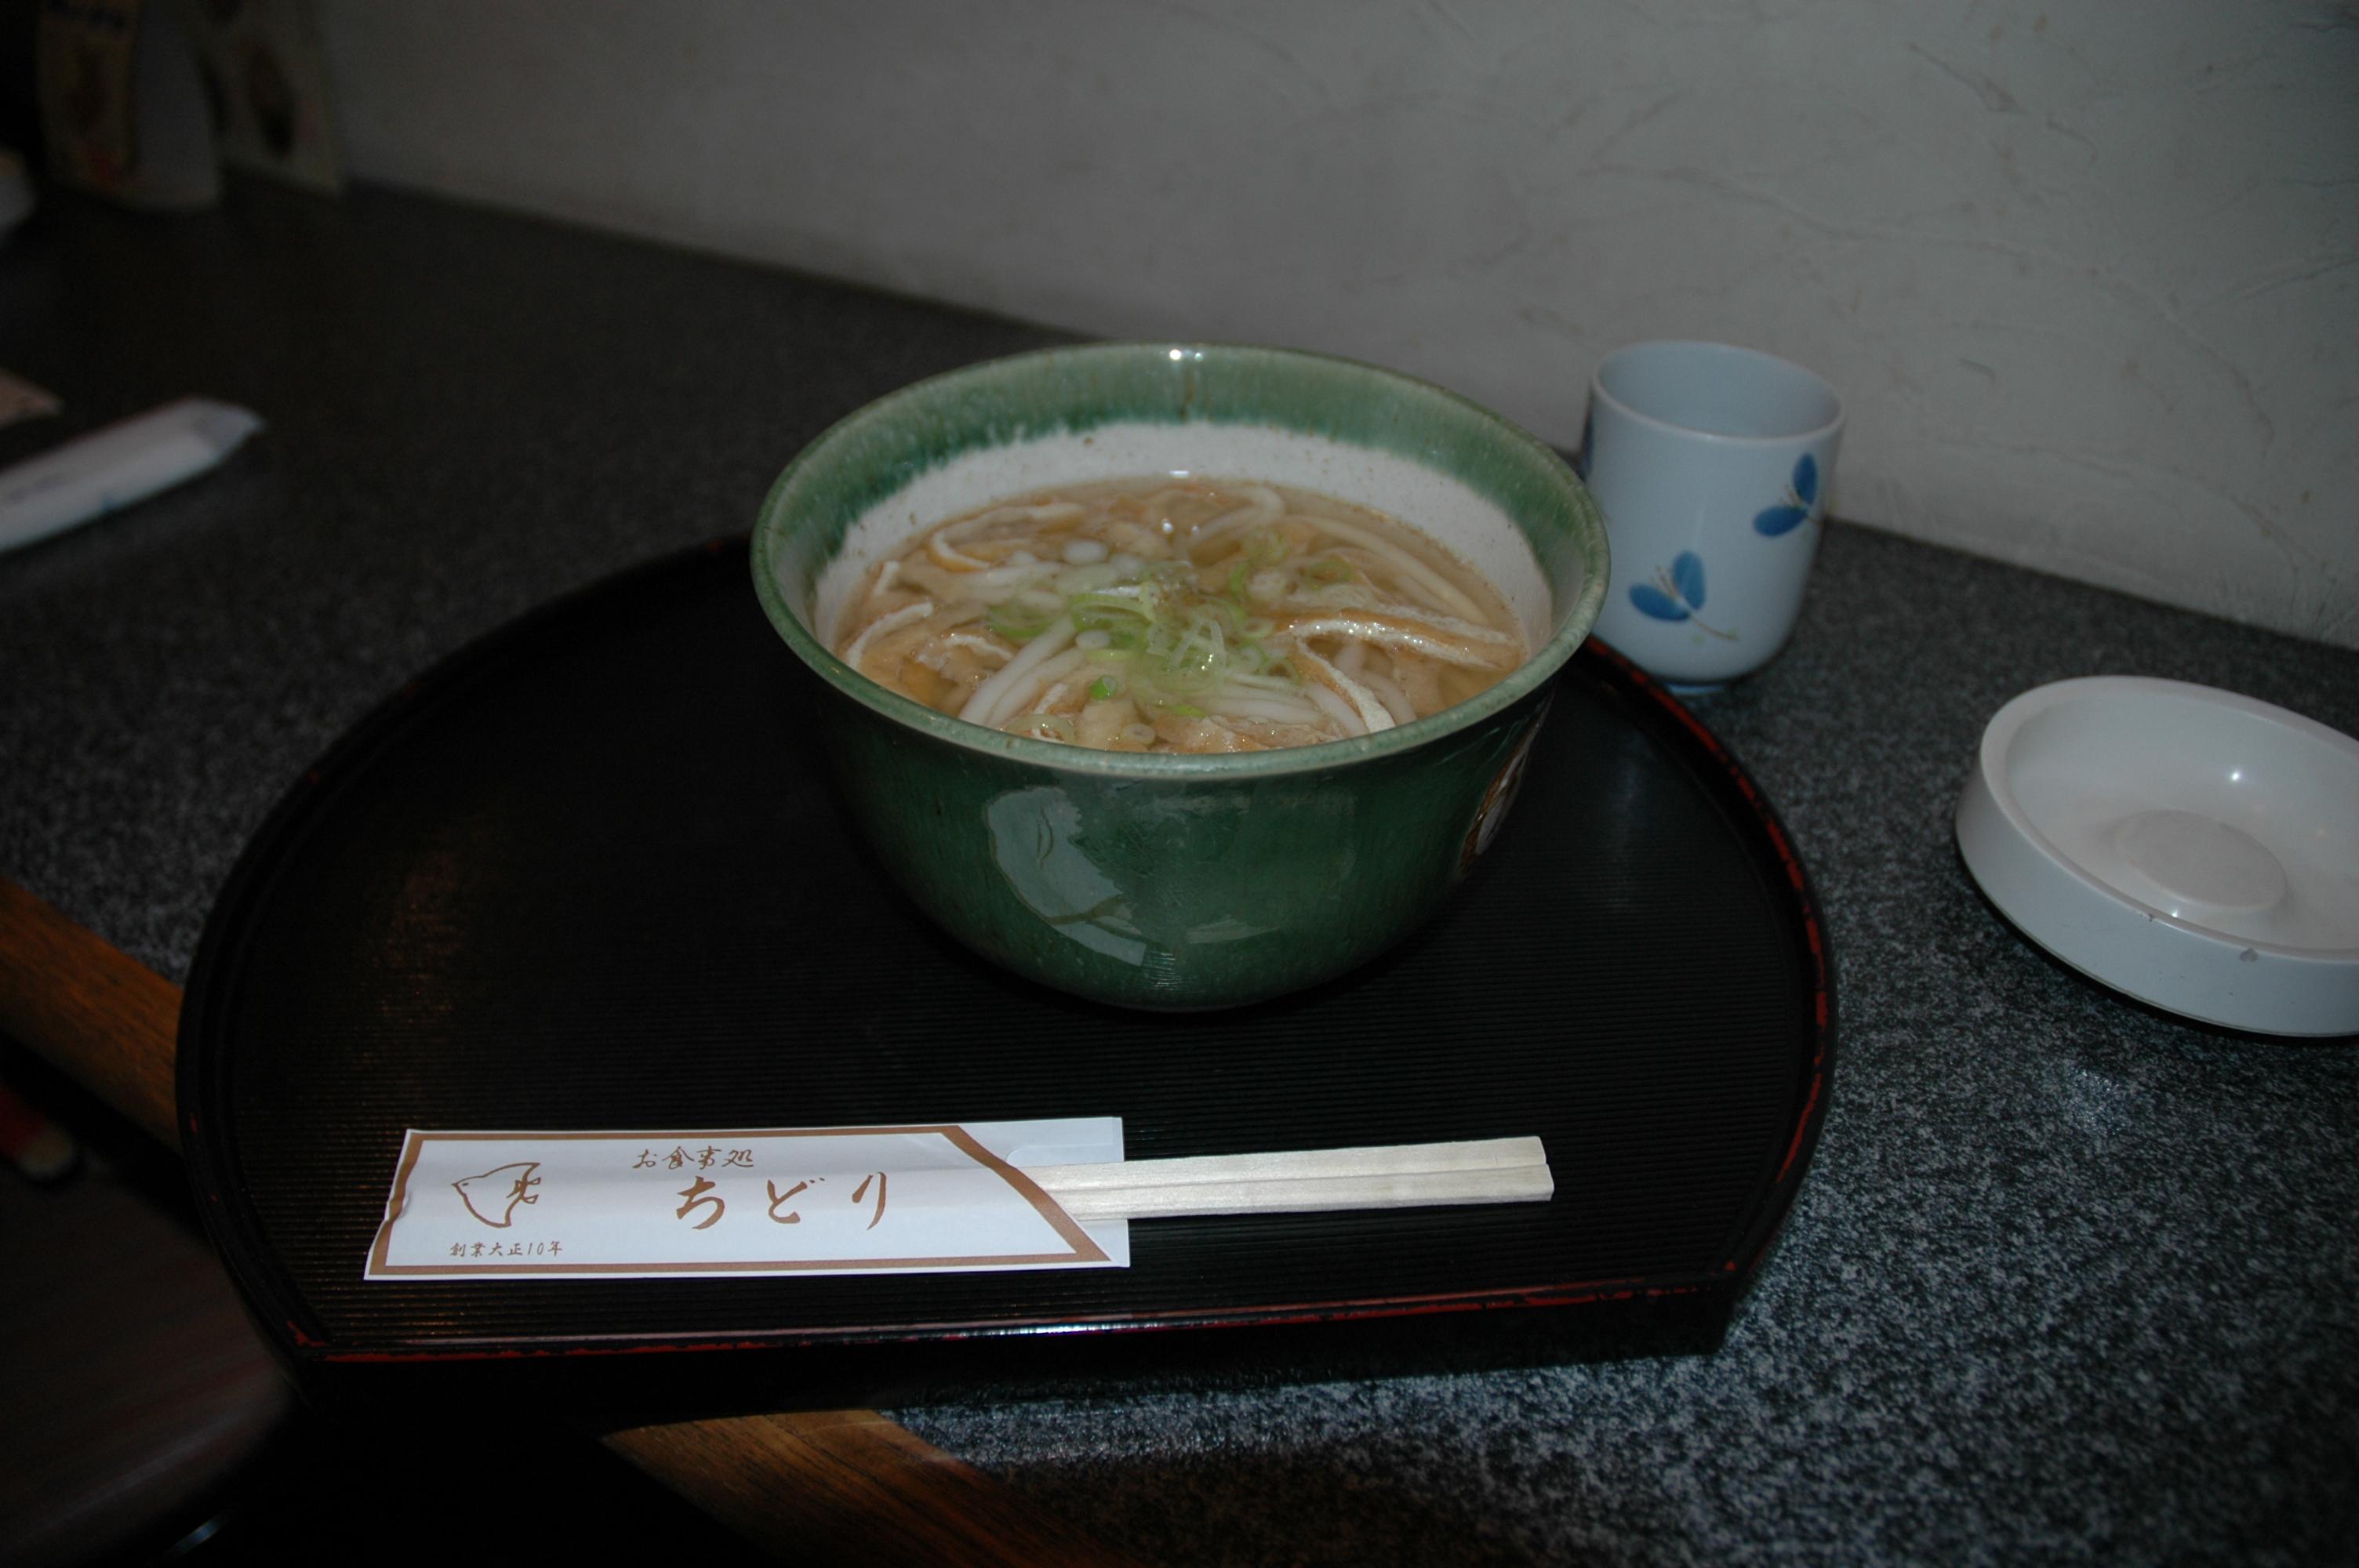 japan_reise_urlaub_kyoto_tokio_yokohama_blog_oceanblue-style.jpg